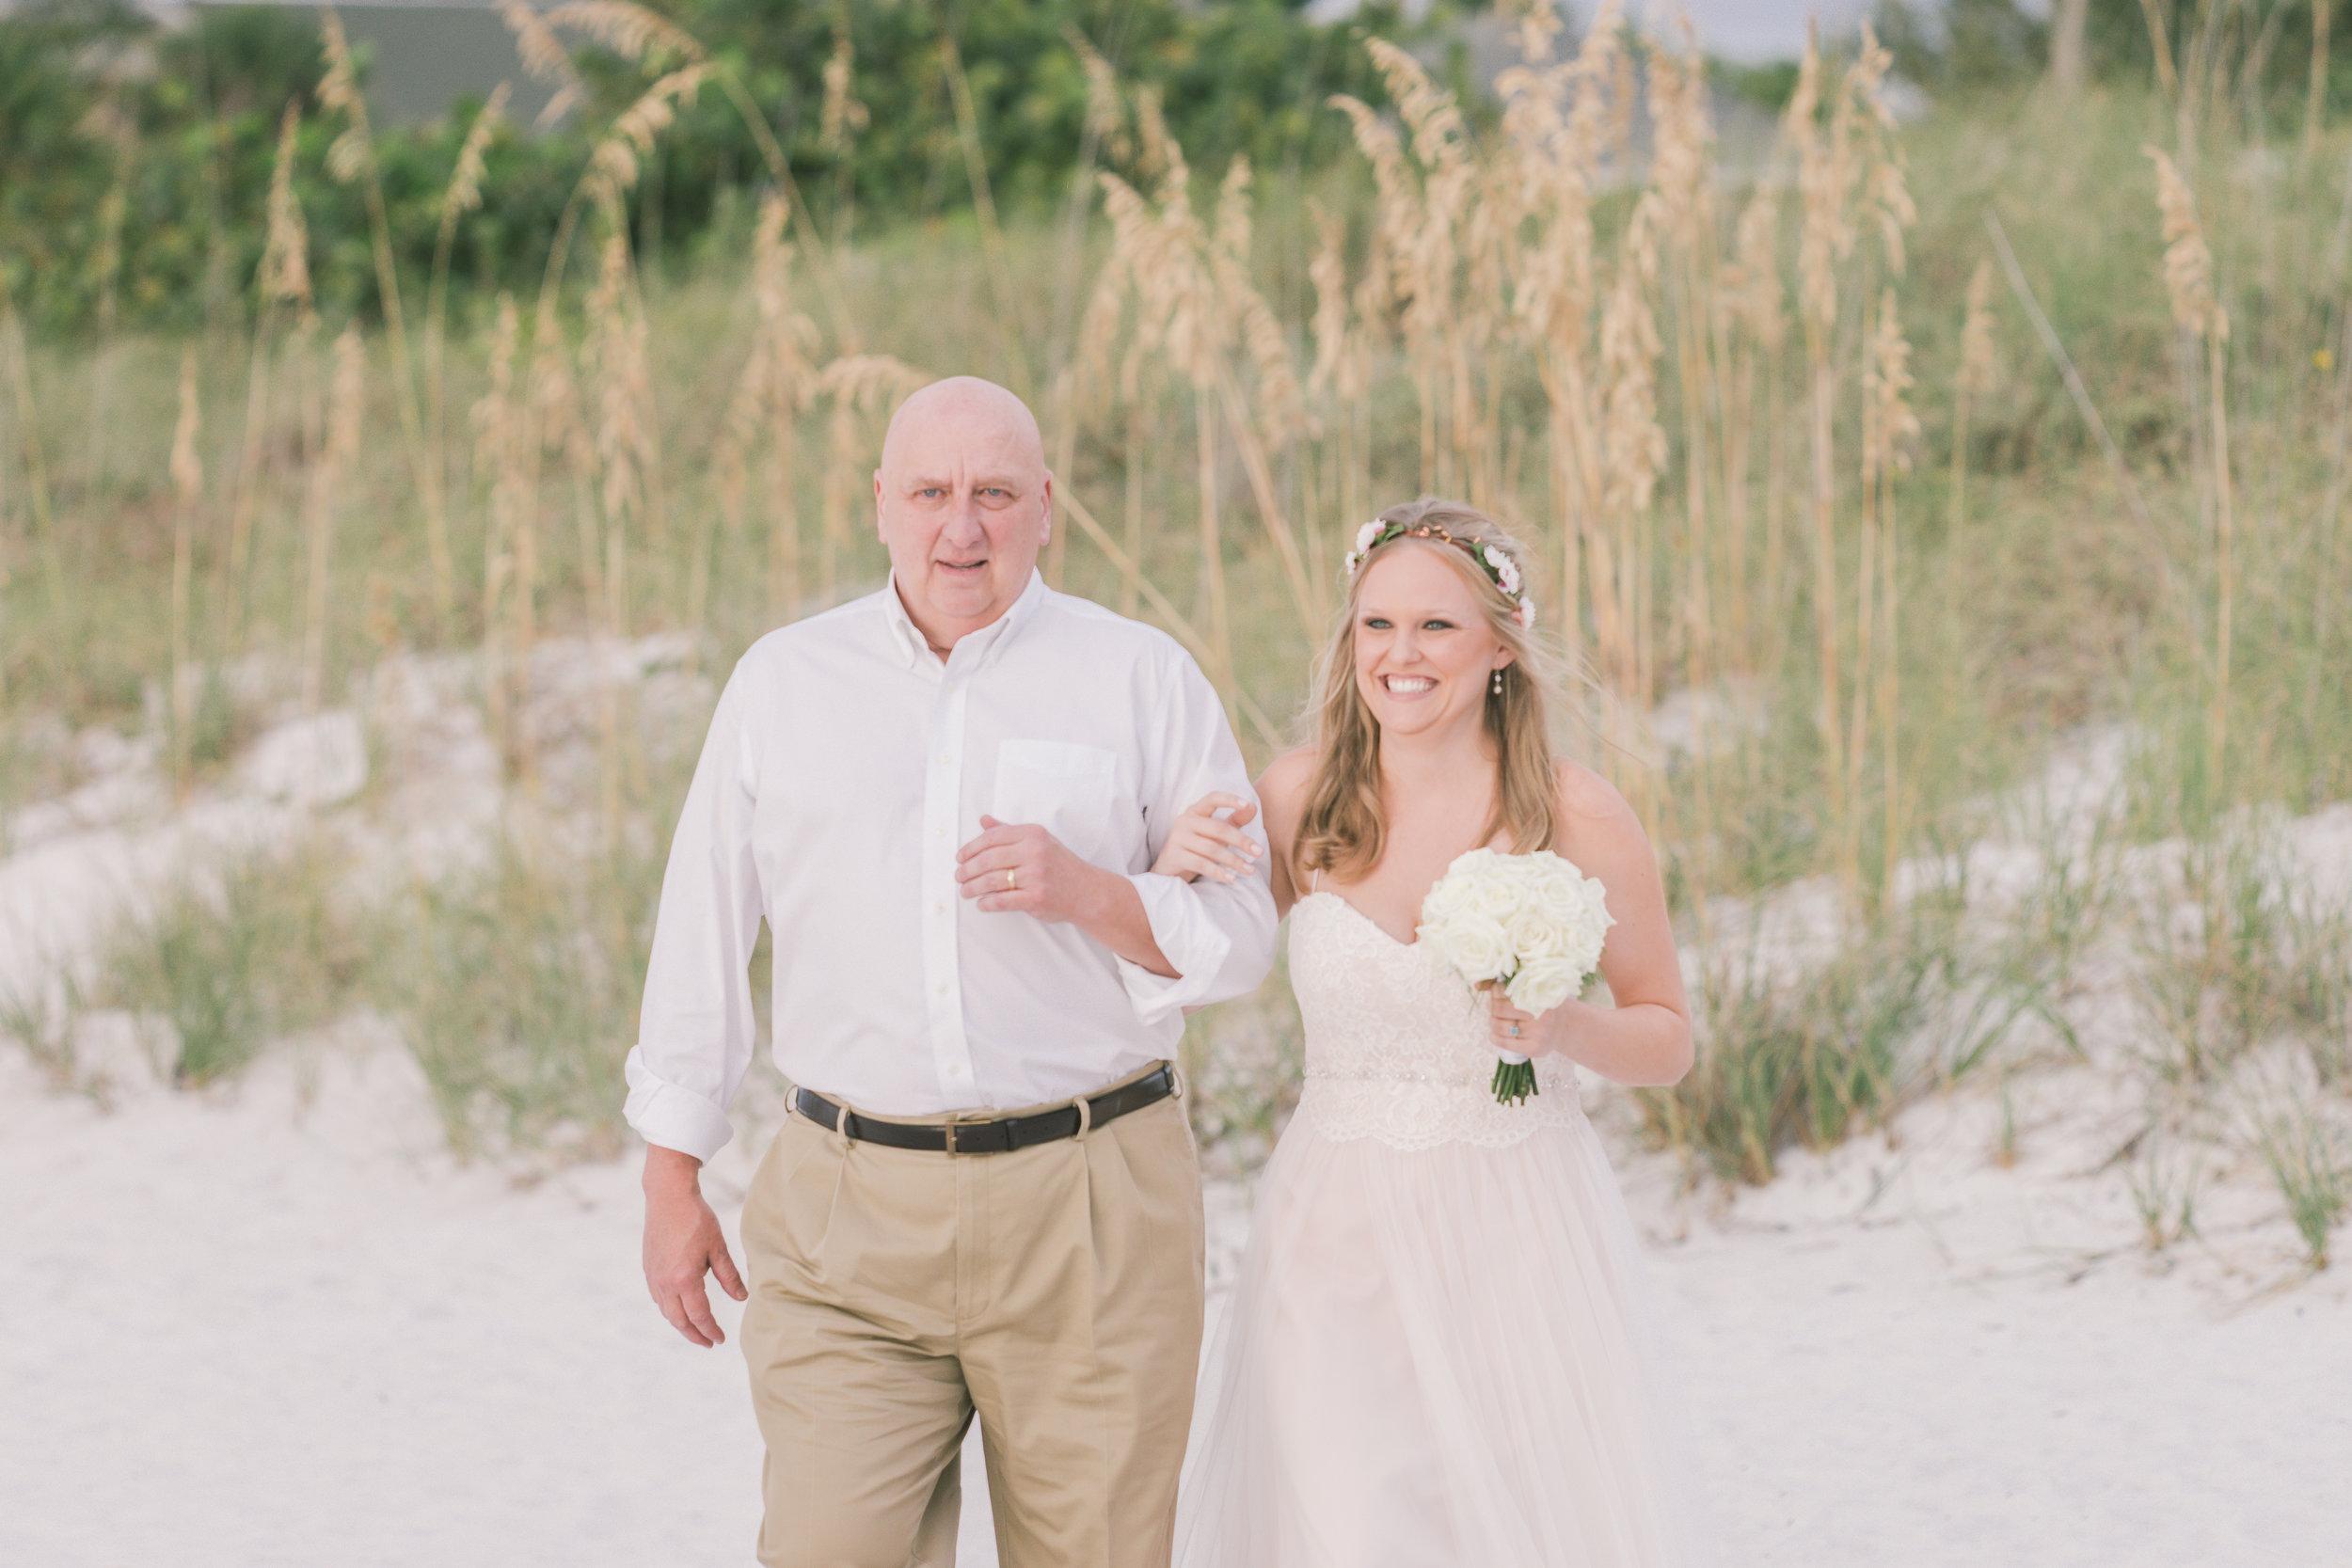 St.Pete wedding, St.Pete wedding photographer. Tampa wedding photographer , Mir Salgado Photographer, Elopment photographer. Tampa elopement photographer